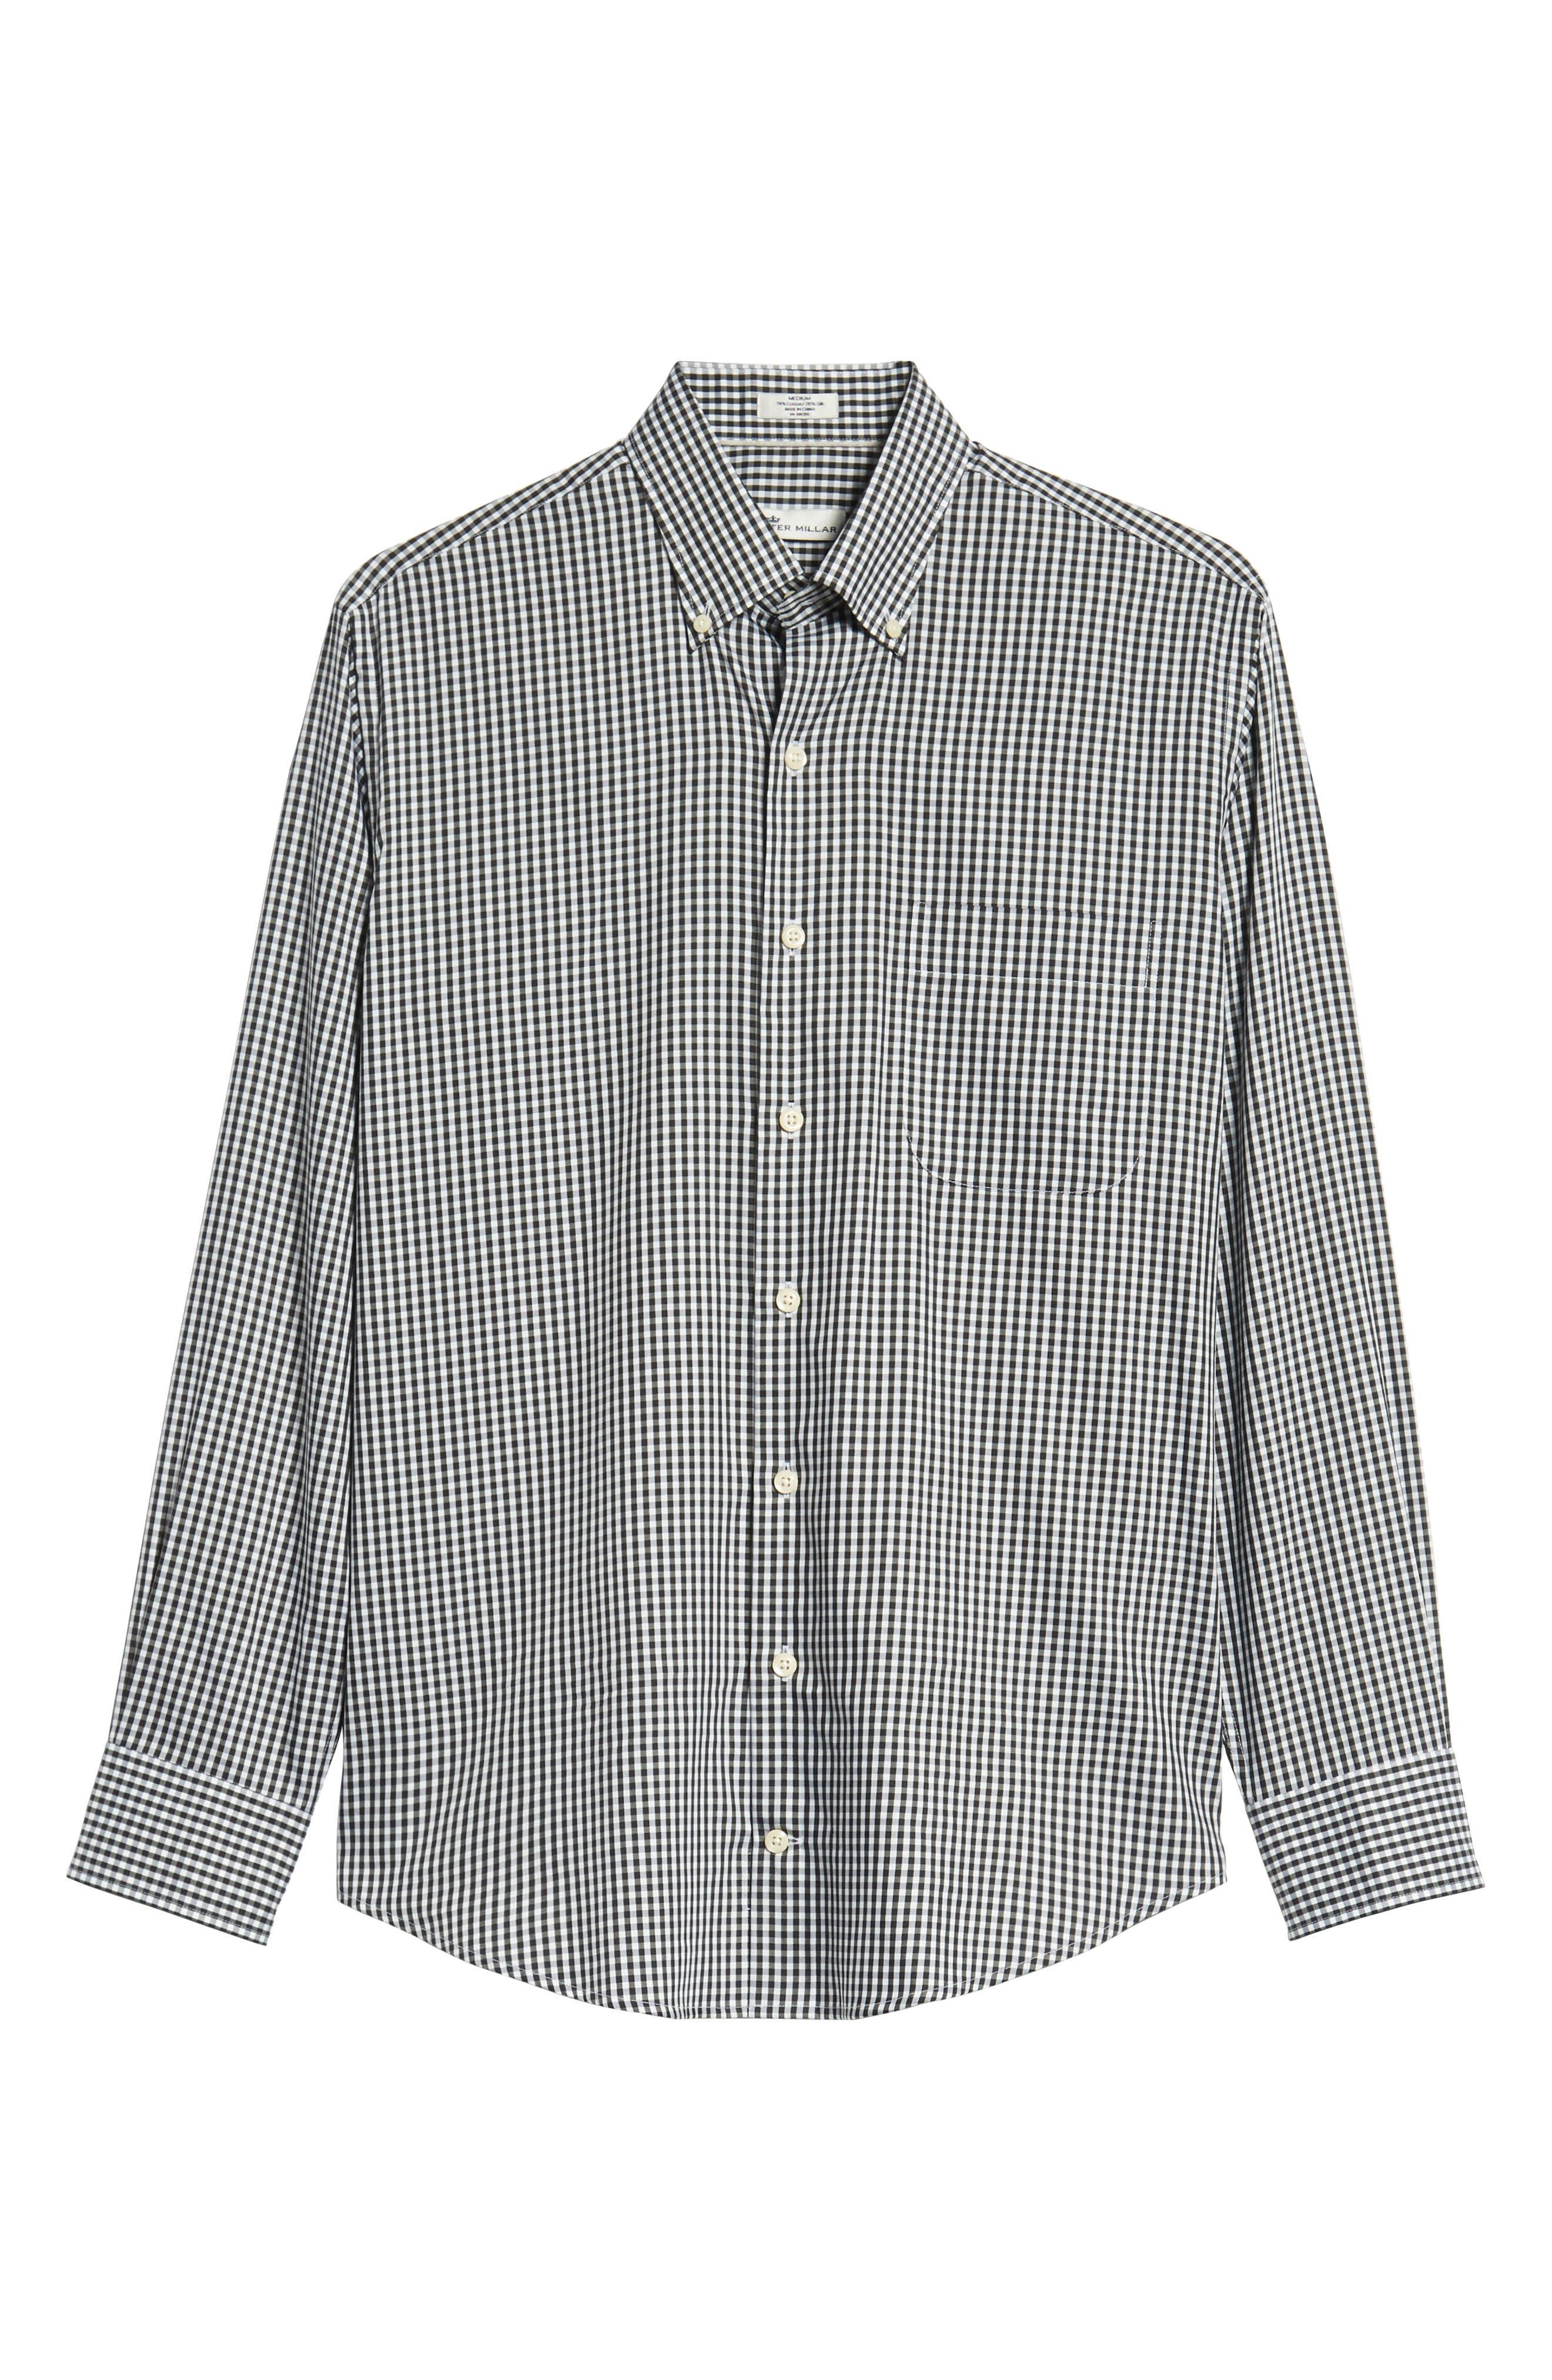 Crown Soft Gingham Regular Fit Sport Shirt,                             Alternate thumbnail 5, color,                             BLACK